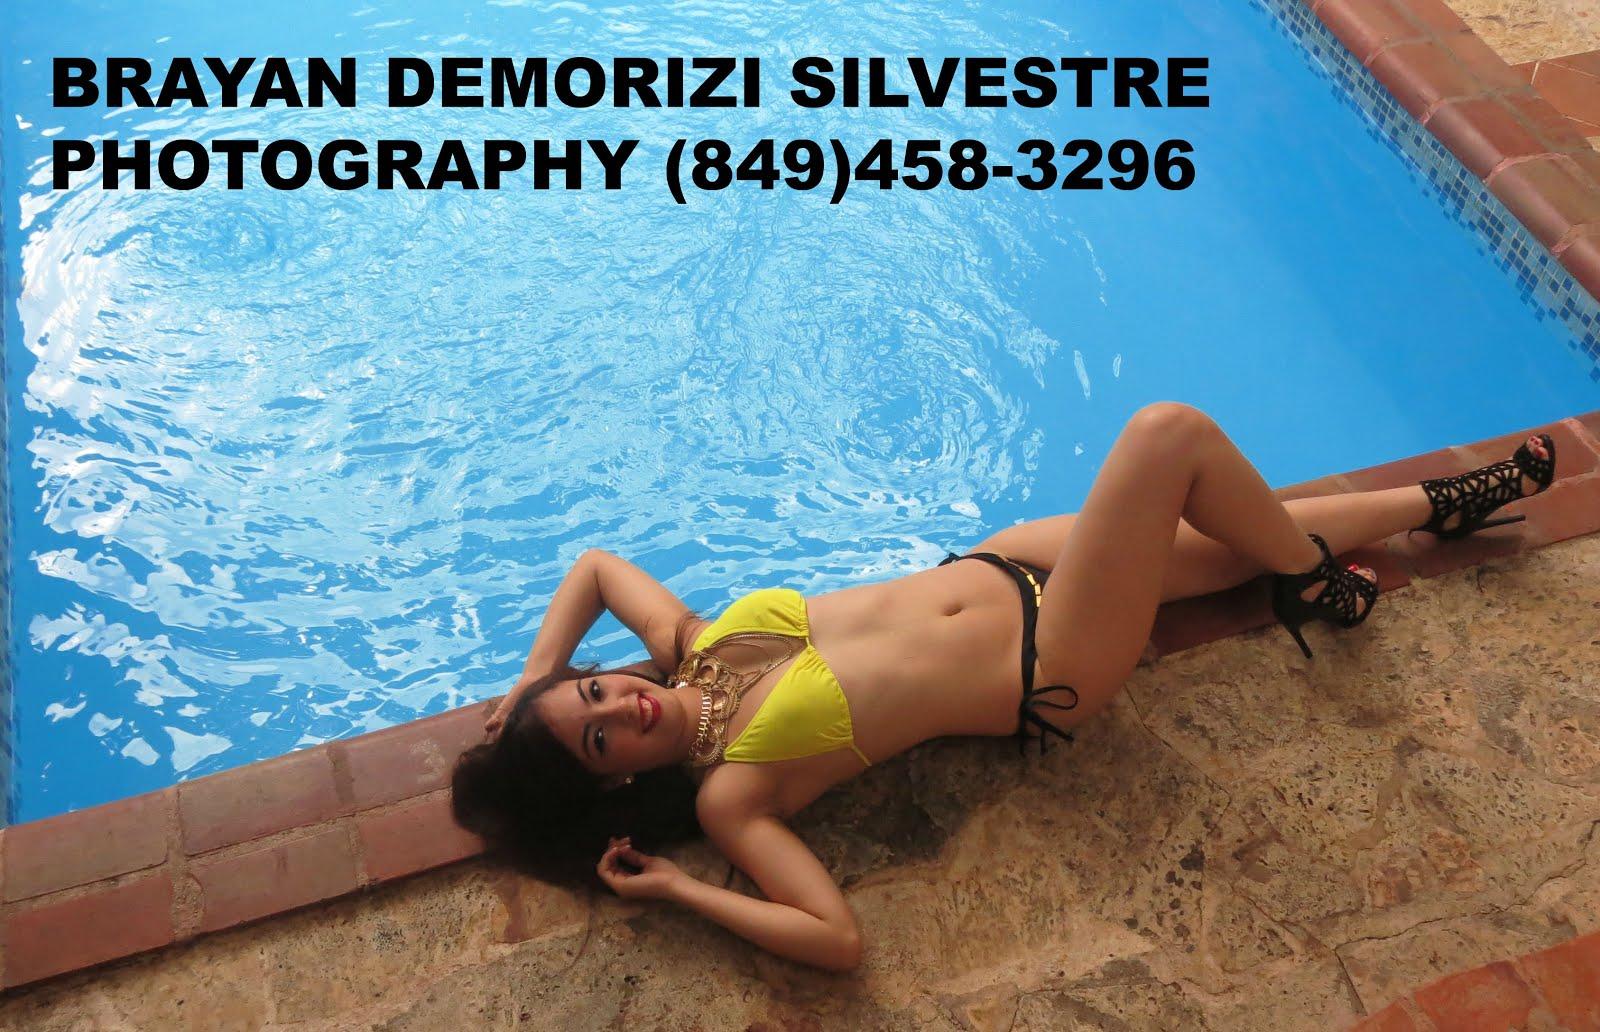 BRAYAN DEMORIZI SILVESTRE PHOTOGRAPHY